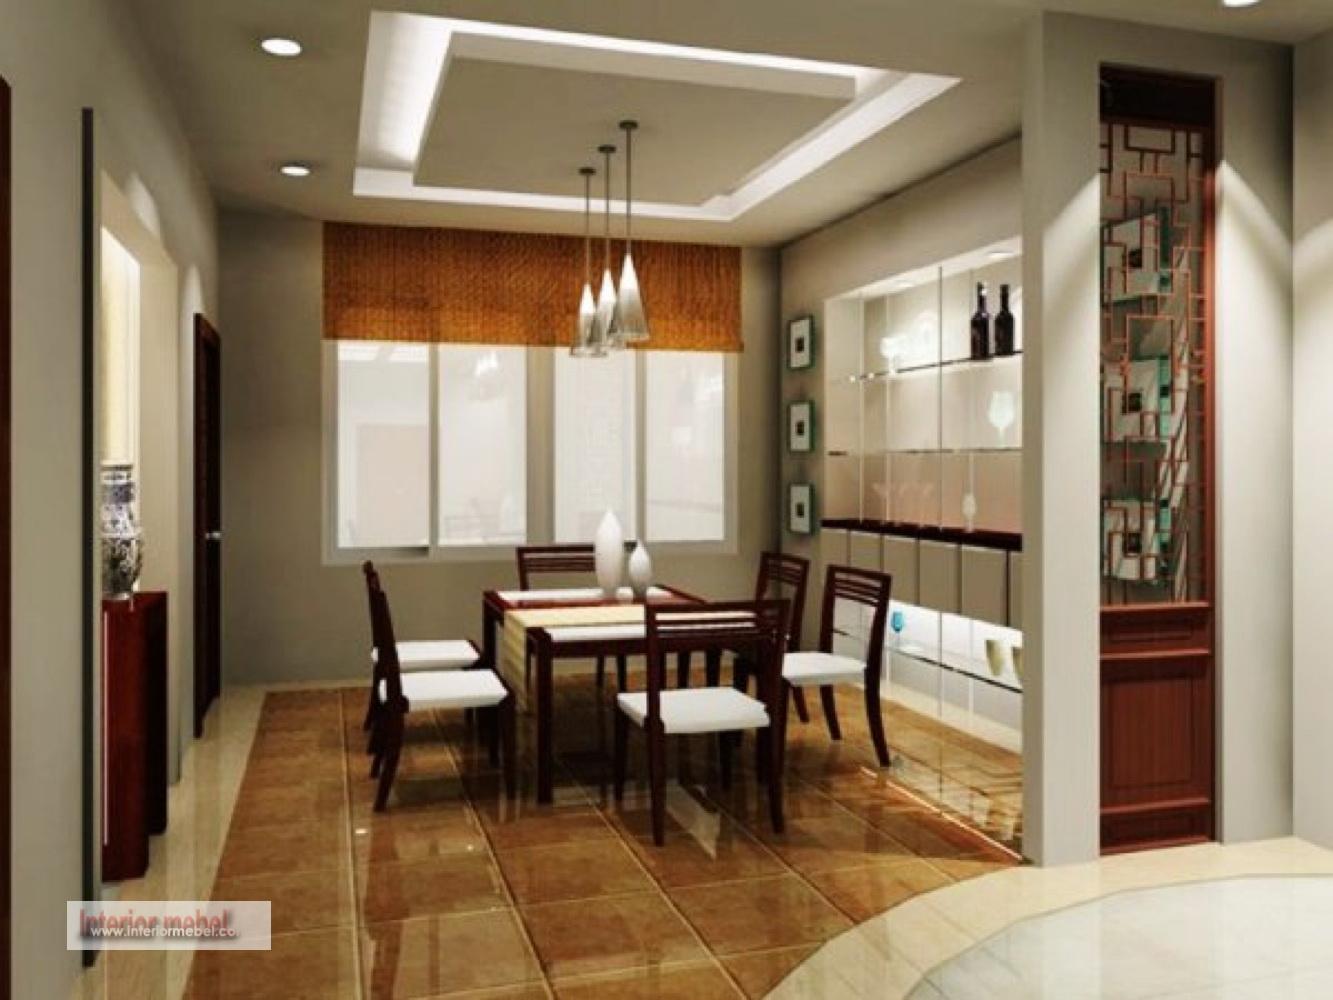 Desain Plafon Dapur Minimalis Furniturumah